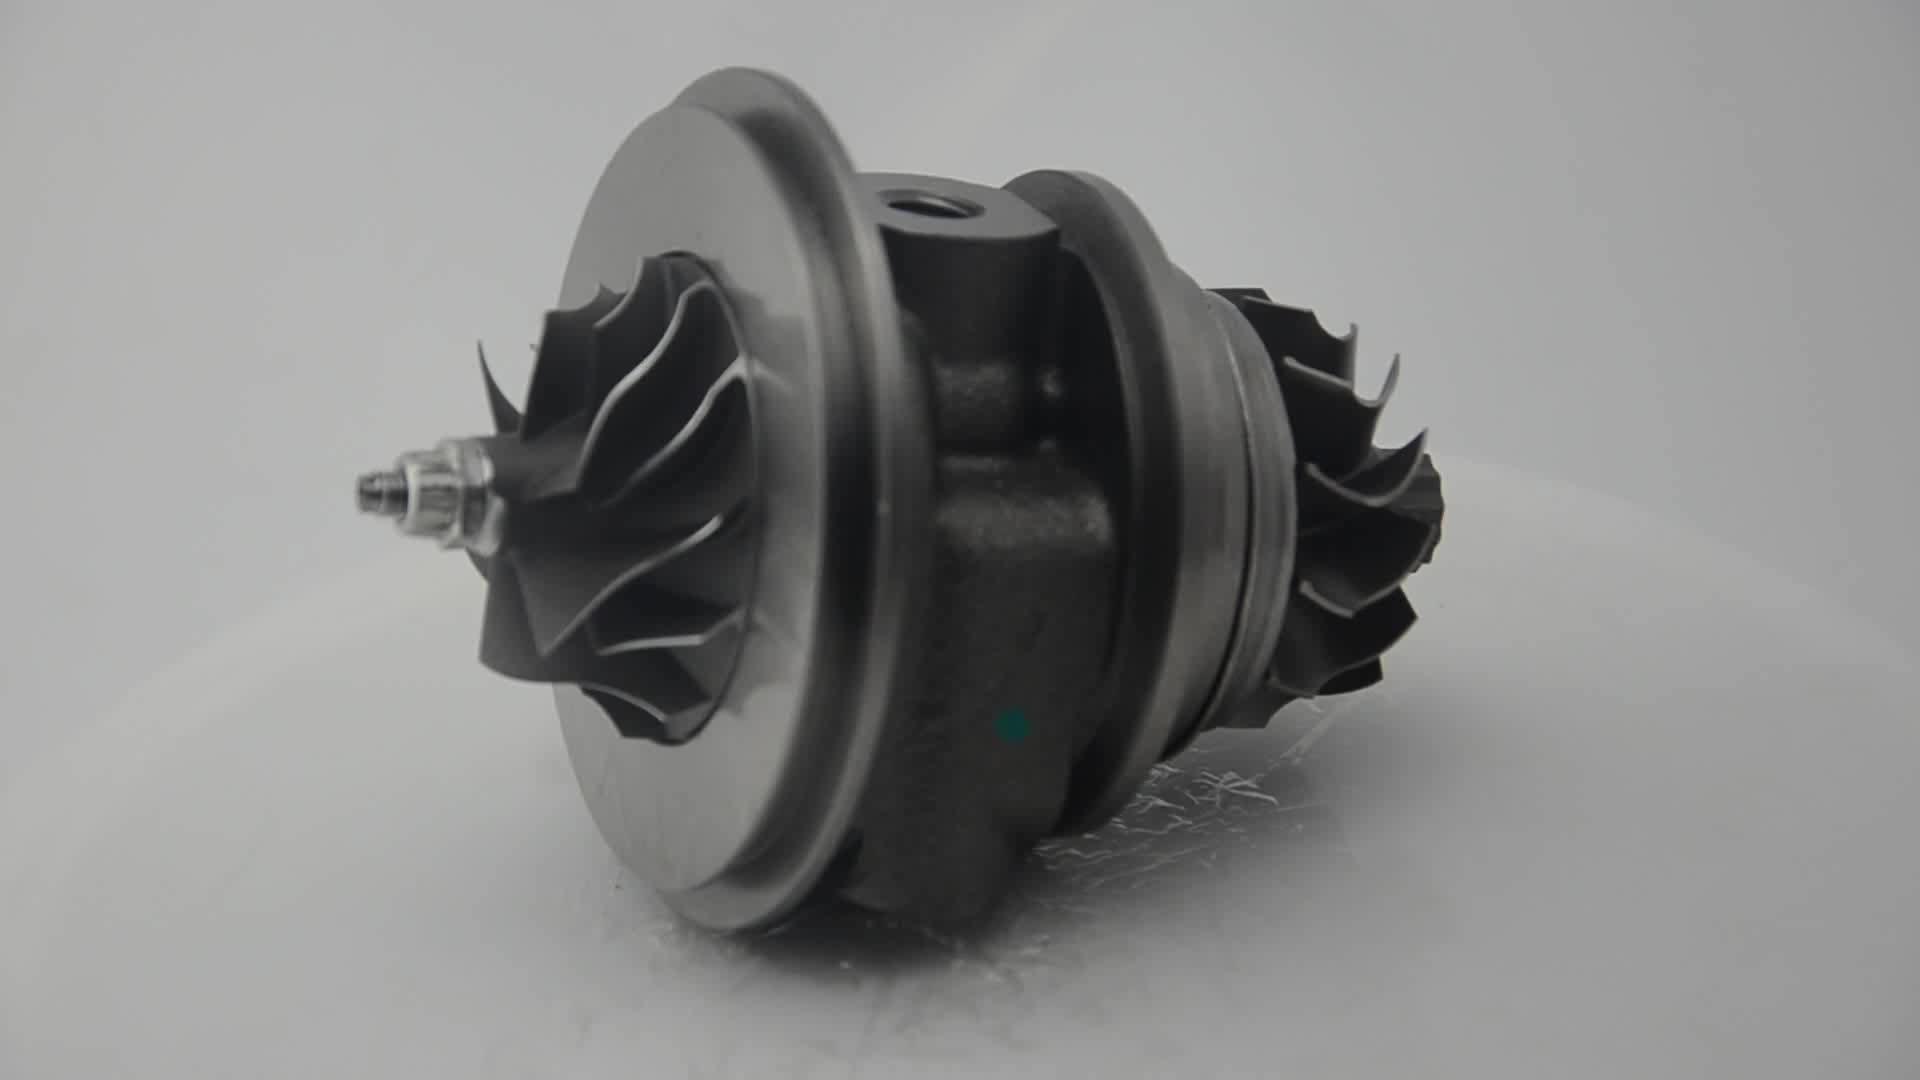 TD04 turbo cartuccia 49377-03041 49377-03043 CHRA ME201636 ME201258 turbina per Mitsubishi Pajero II 2.8 TD 92 Kw-125 HP 4M40